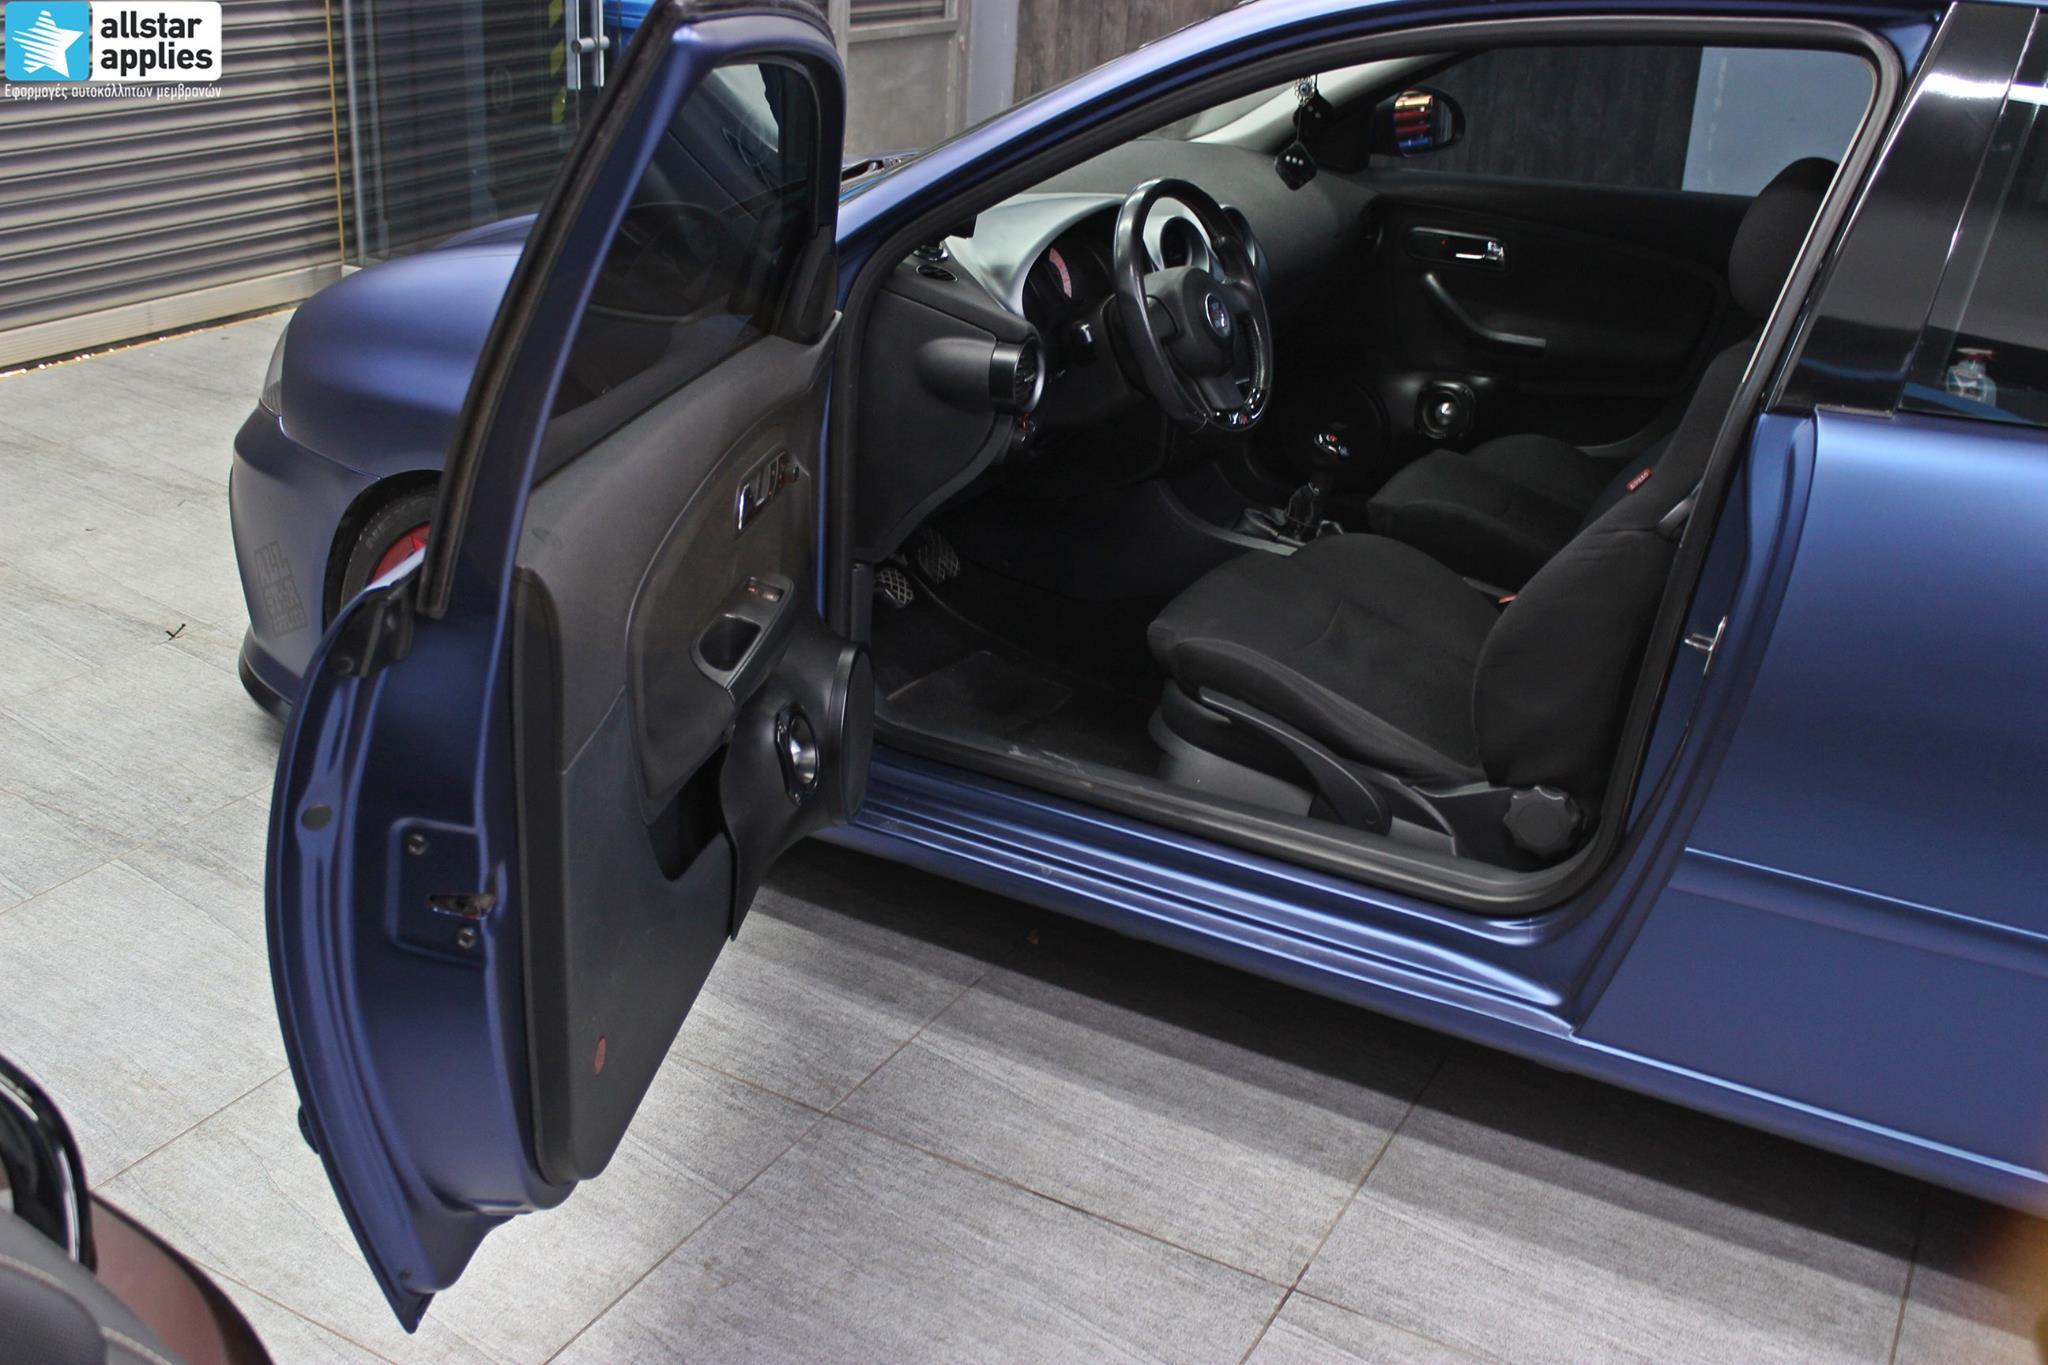 Seat Ibiza - Matte Trenton Blue (11)